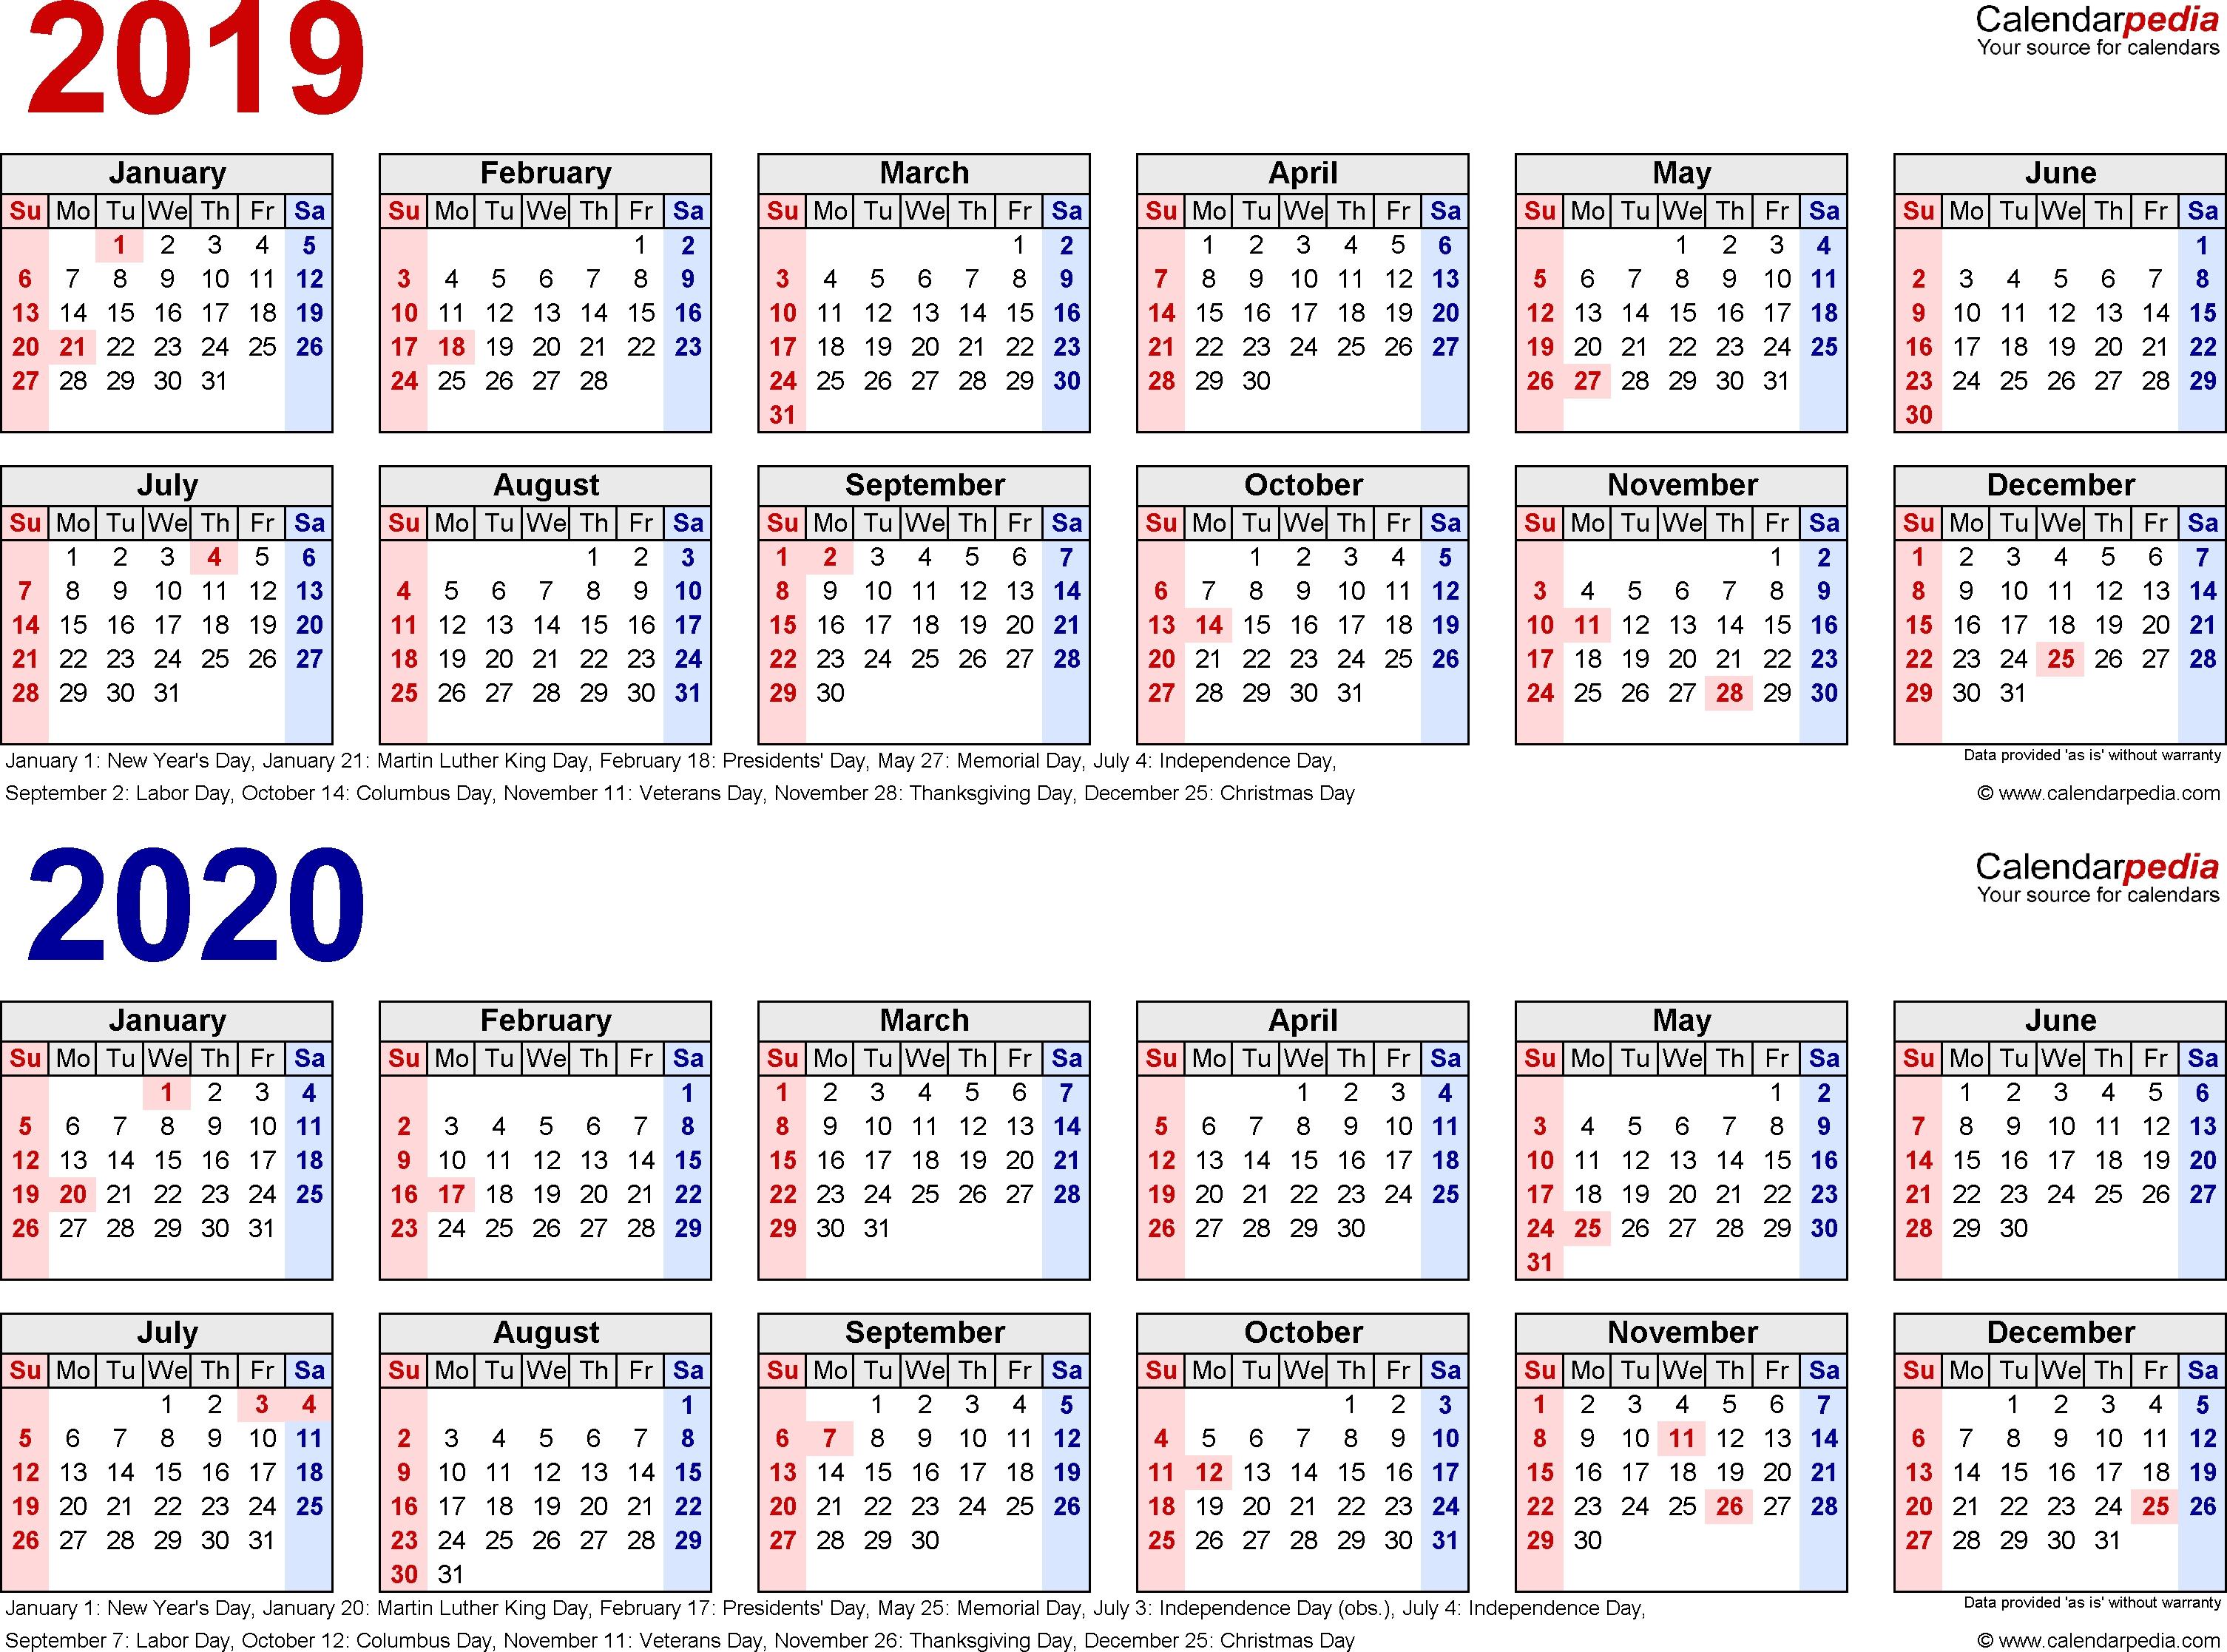 2019-2020 Calendar - Free Printable Two-Year Pdf Calendars-Free Printable 2 Page Monthly Calendar 2020